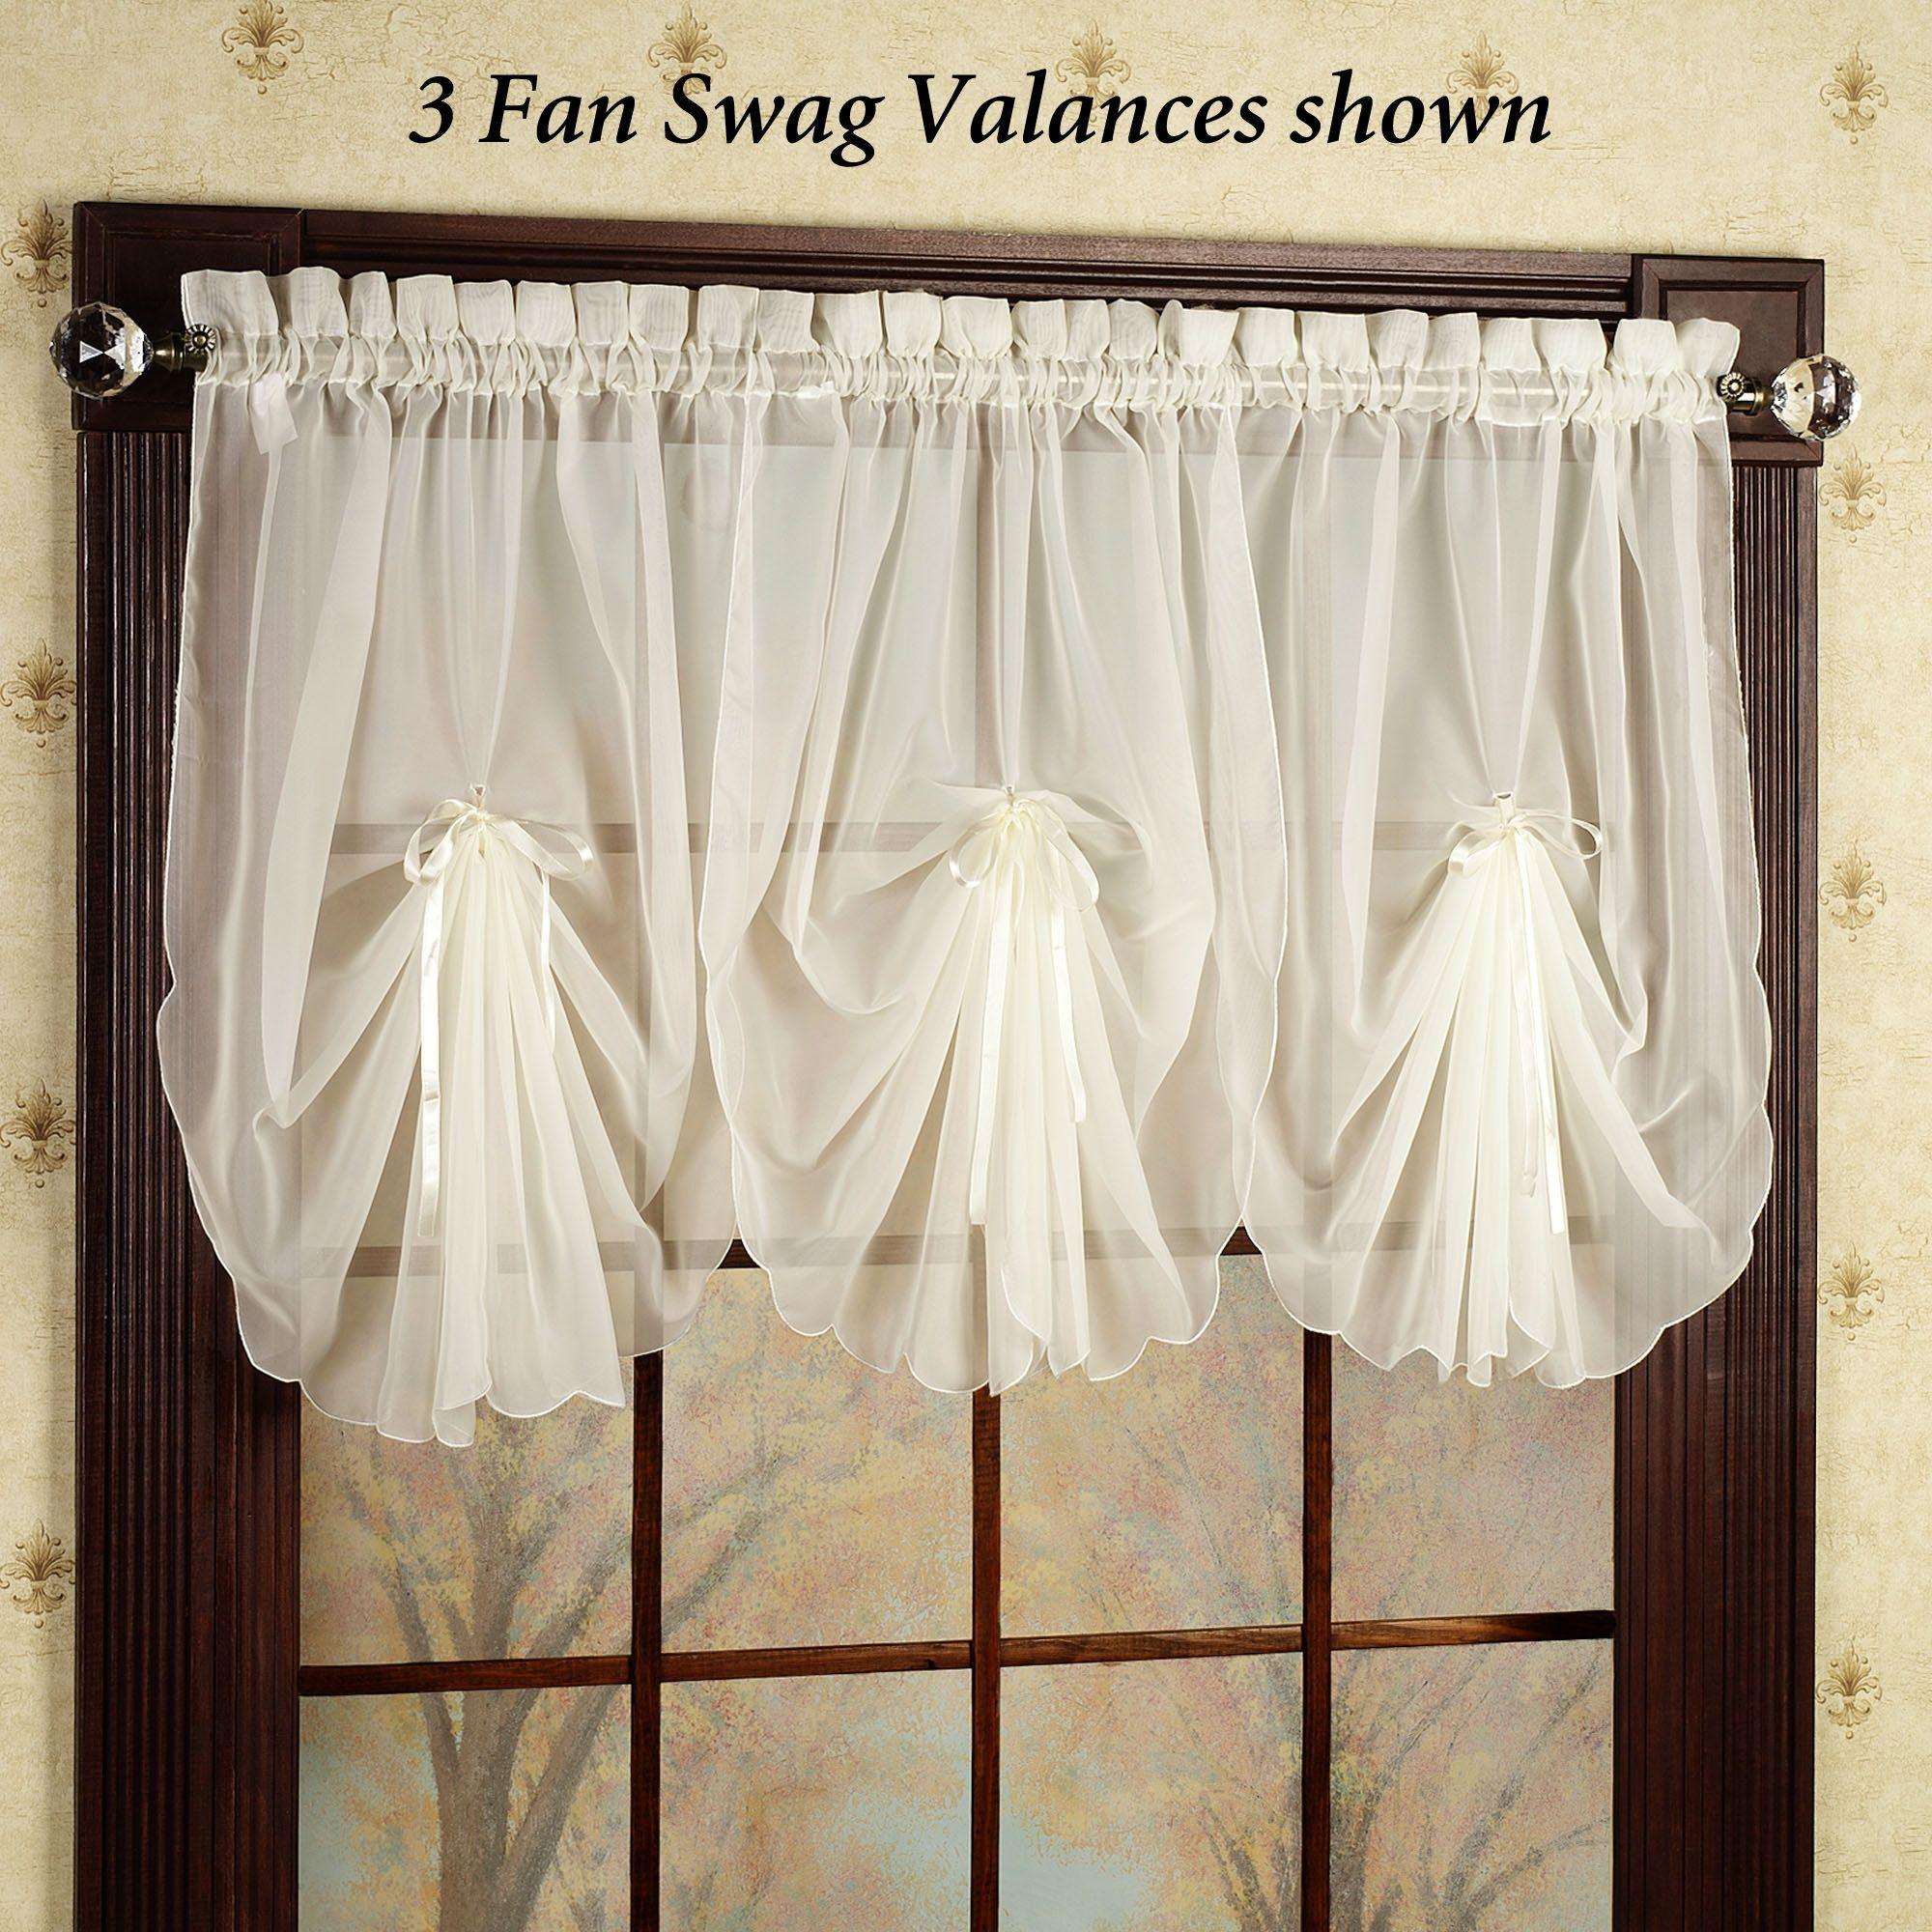 Bedroom Valances For Windows Dizajn Okna Shtory Lambreken